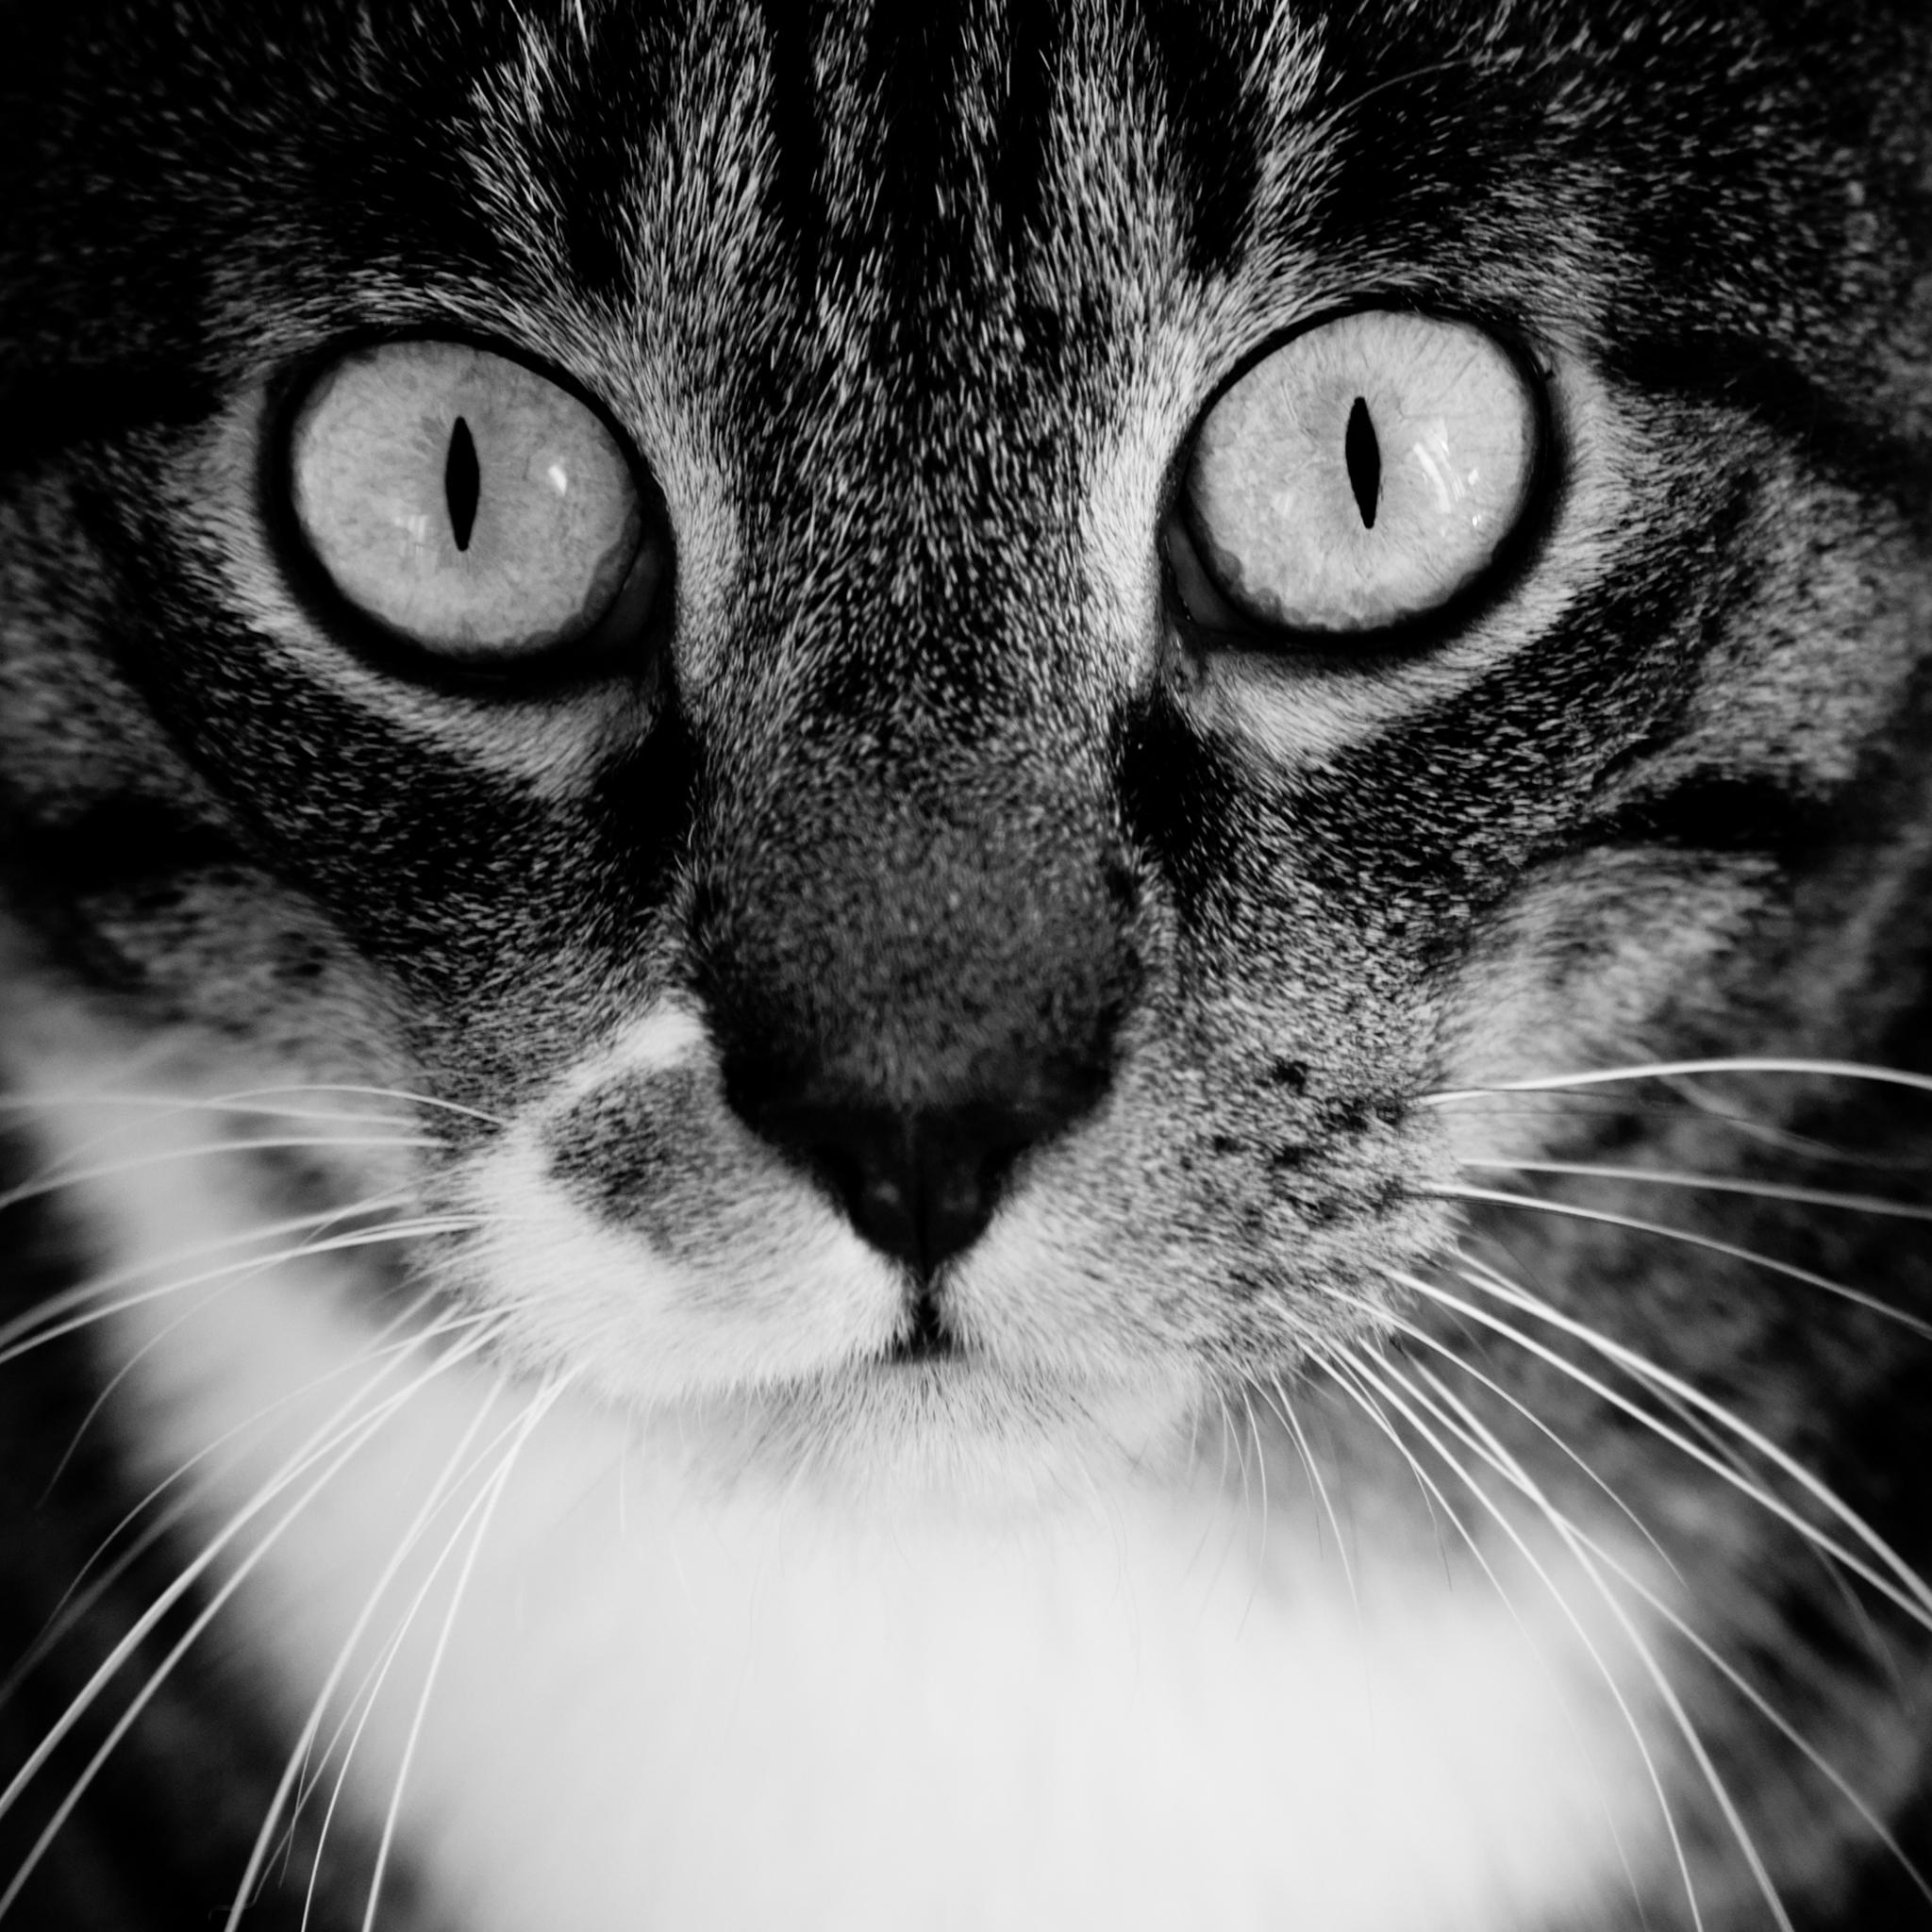 Black and White Cat 3Wallpapers ipad Retina Black and White Cat   iPad